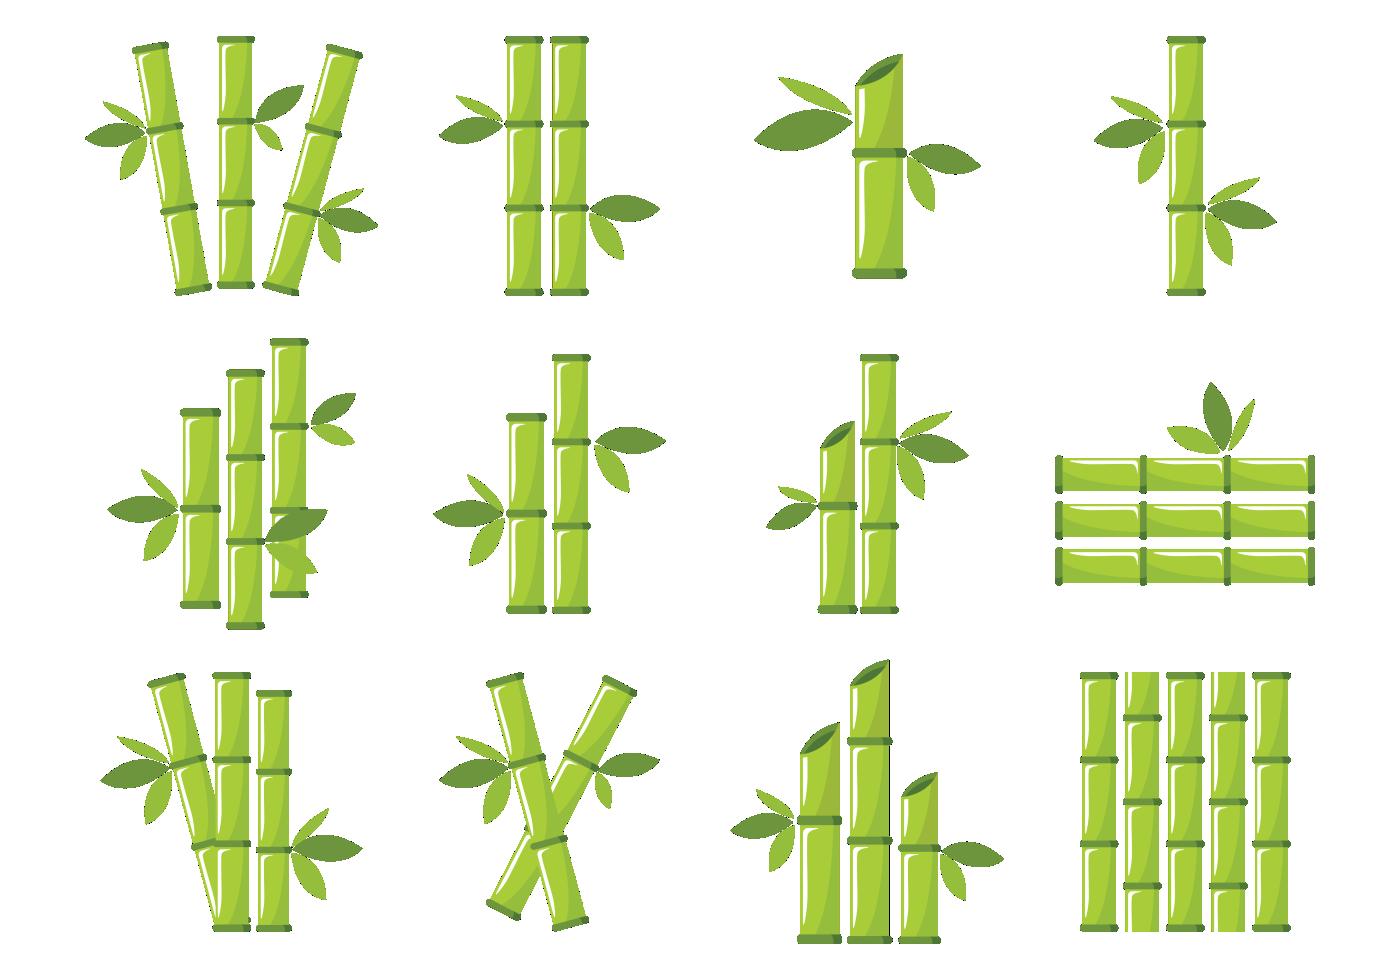 Bamboo stalks, transparent background, to resize